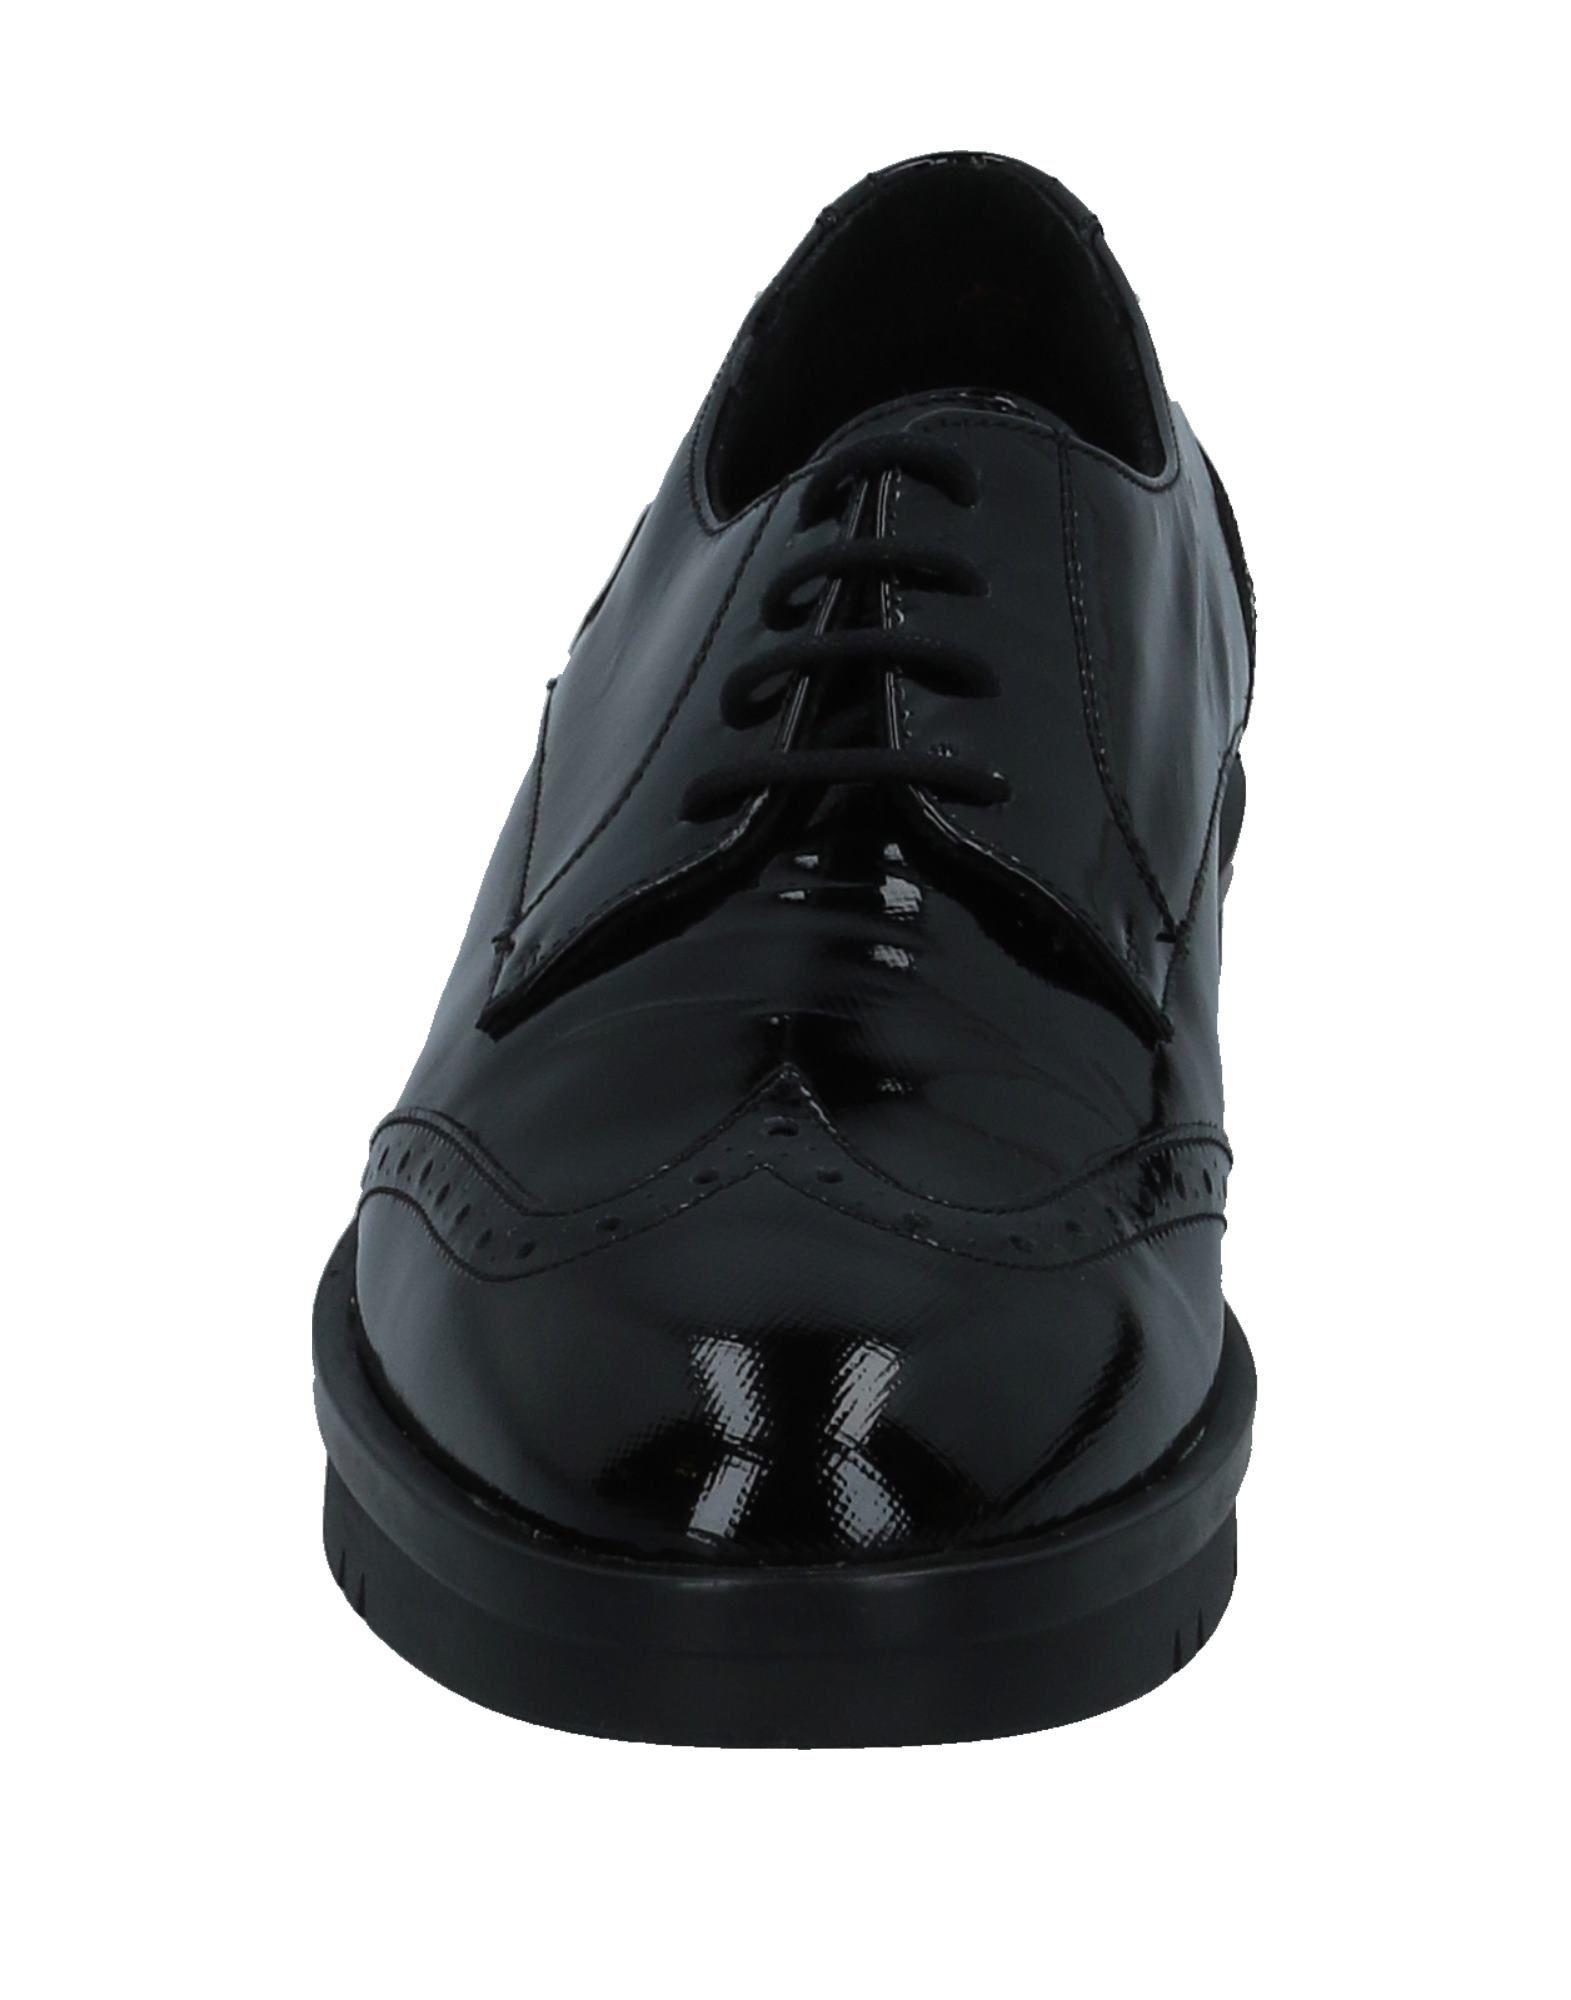 Frau Schnürschuhe Damen  11525632WU Gute Qualität beliebte beliebte beliebte Schuhe 99526f